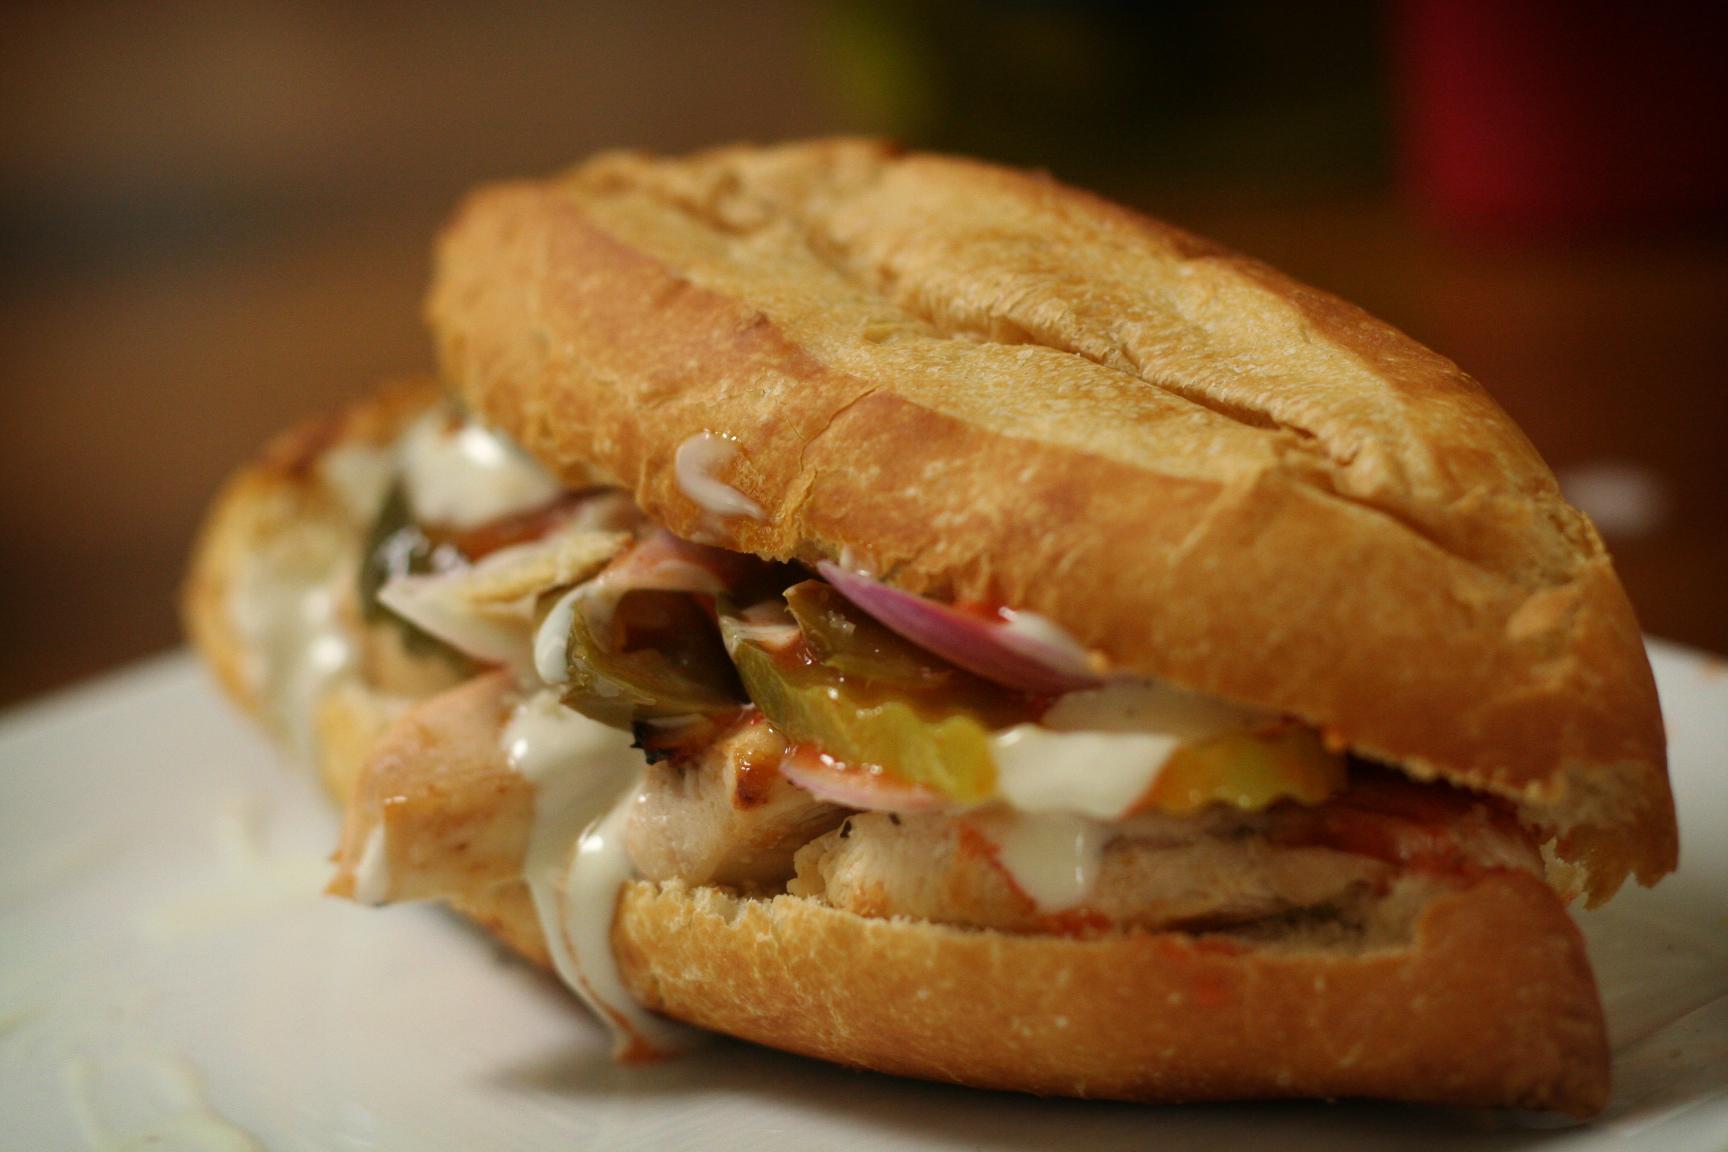 A Subway Buffalo chicken sandwich.